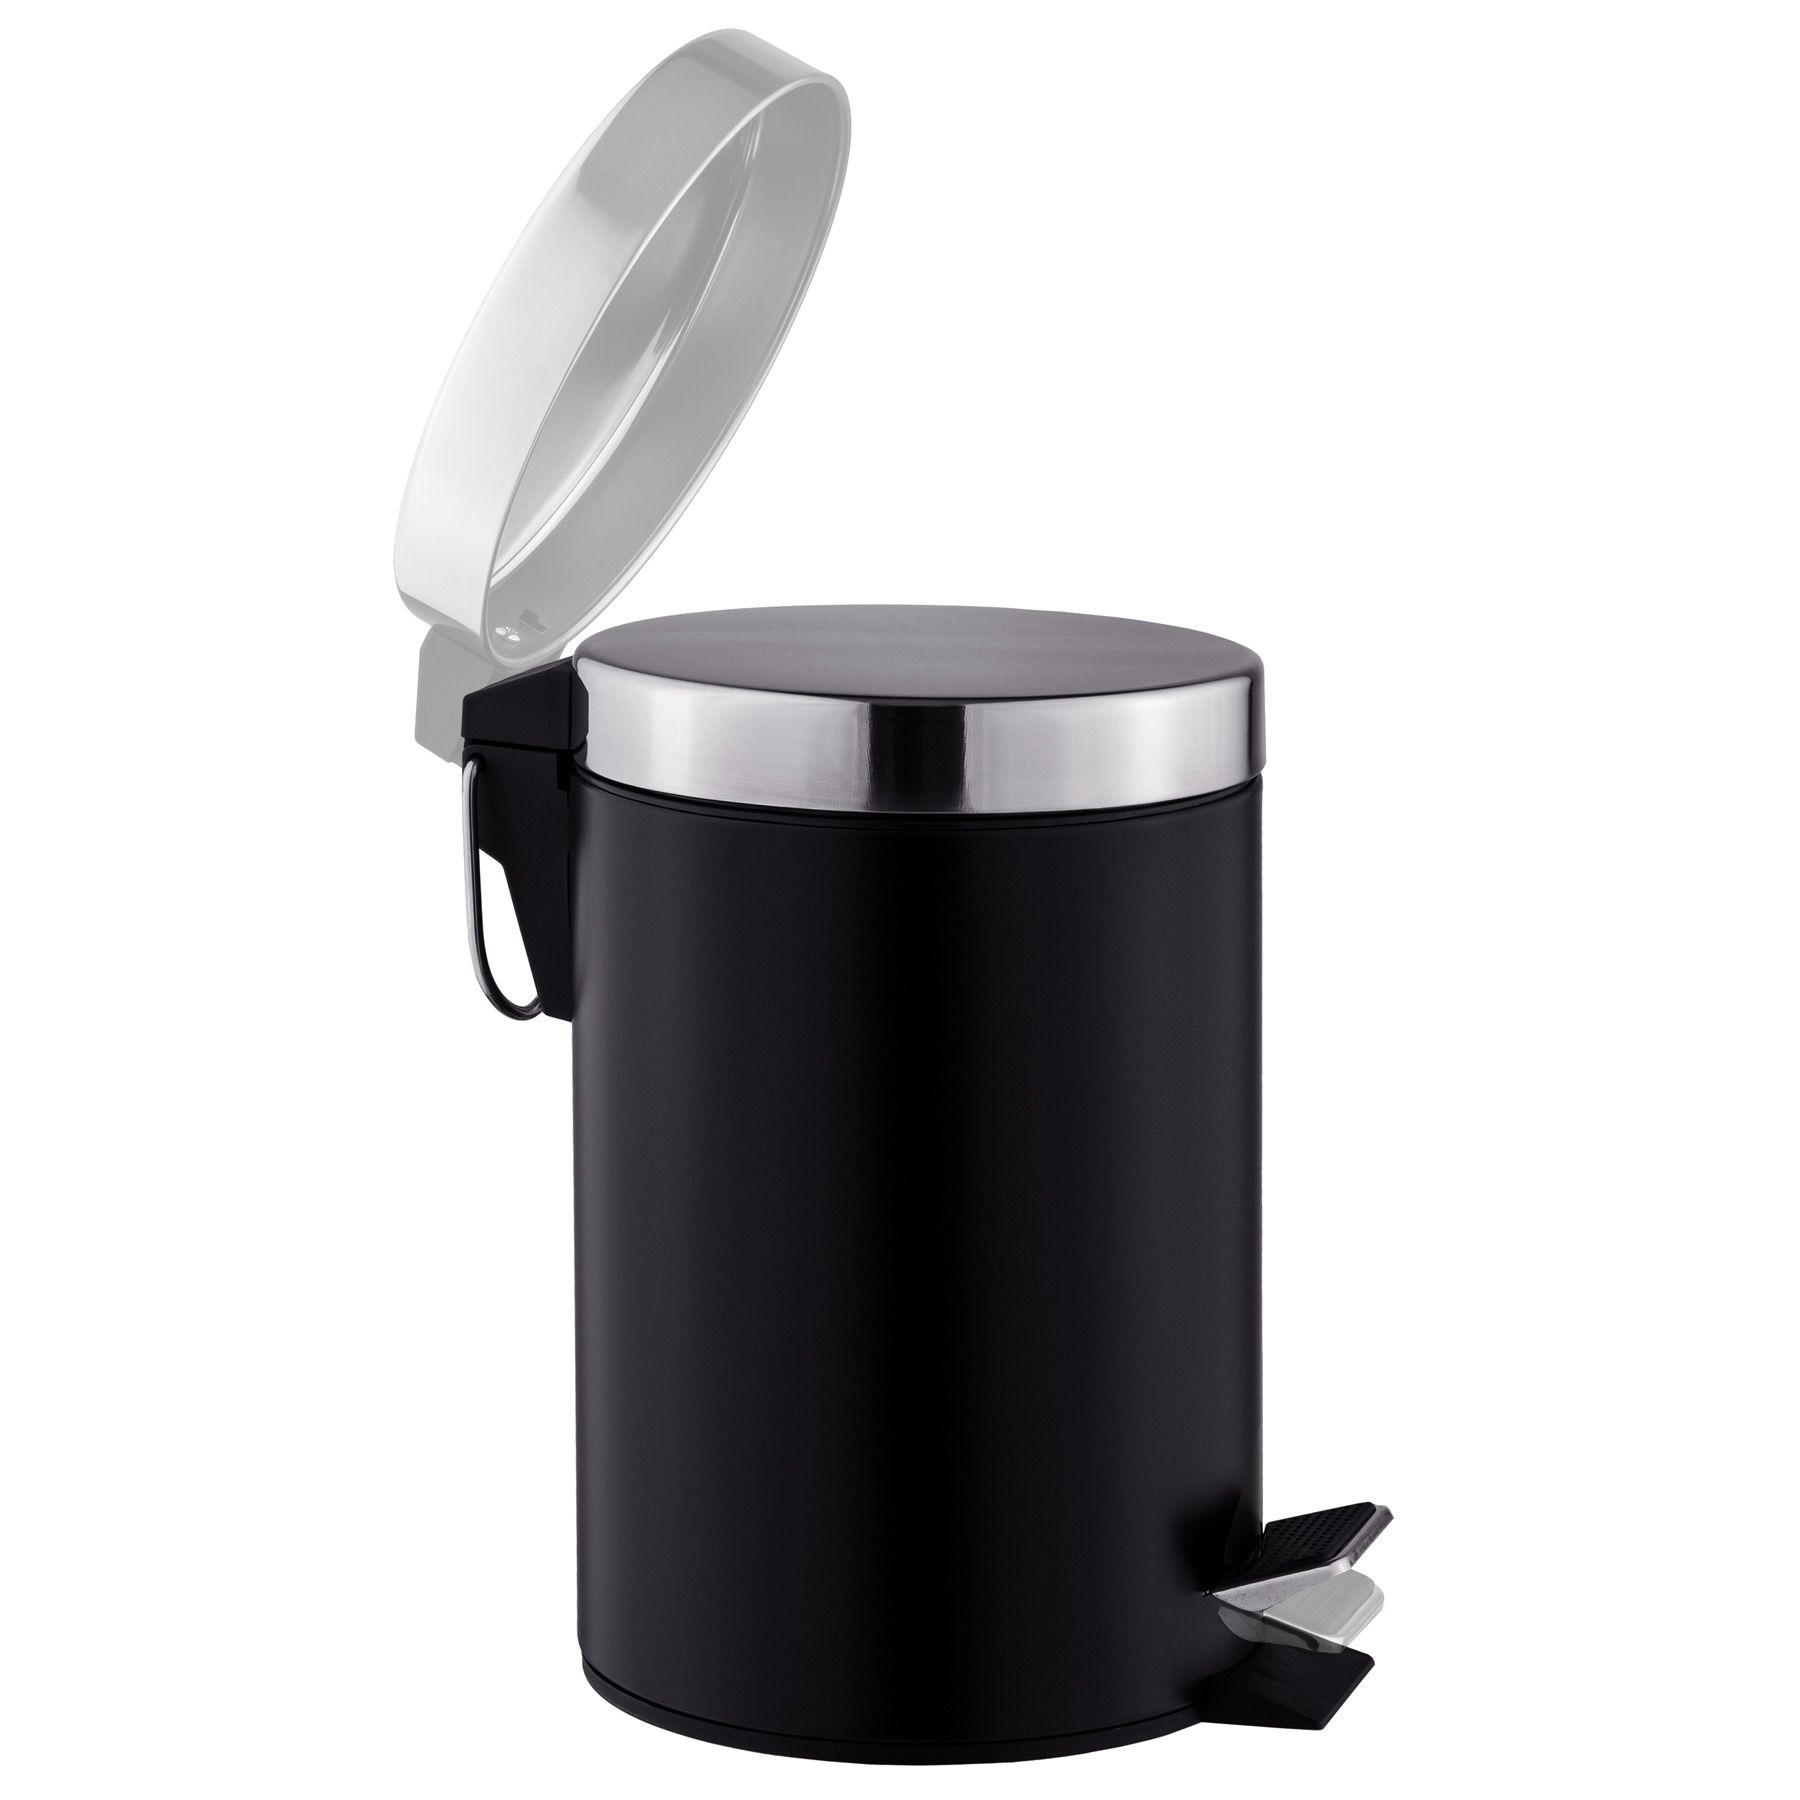 Toilet Roll And Brush Holder Dust Bin Bath Accessory Set